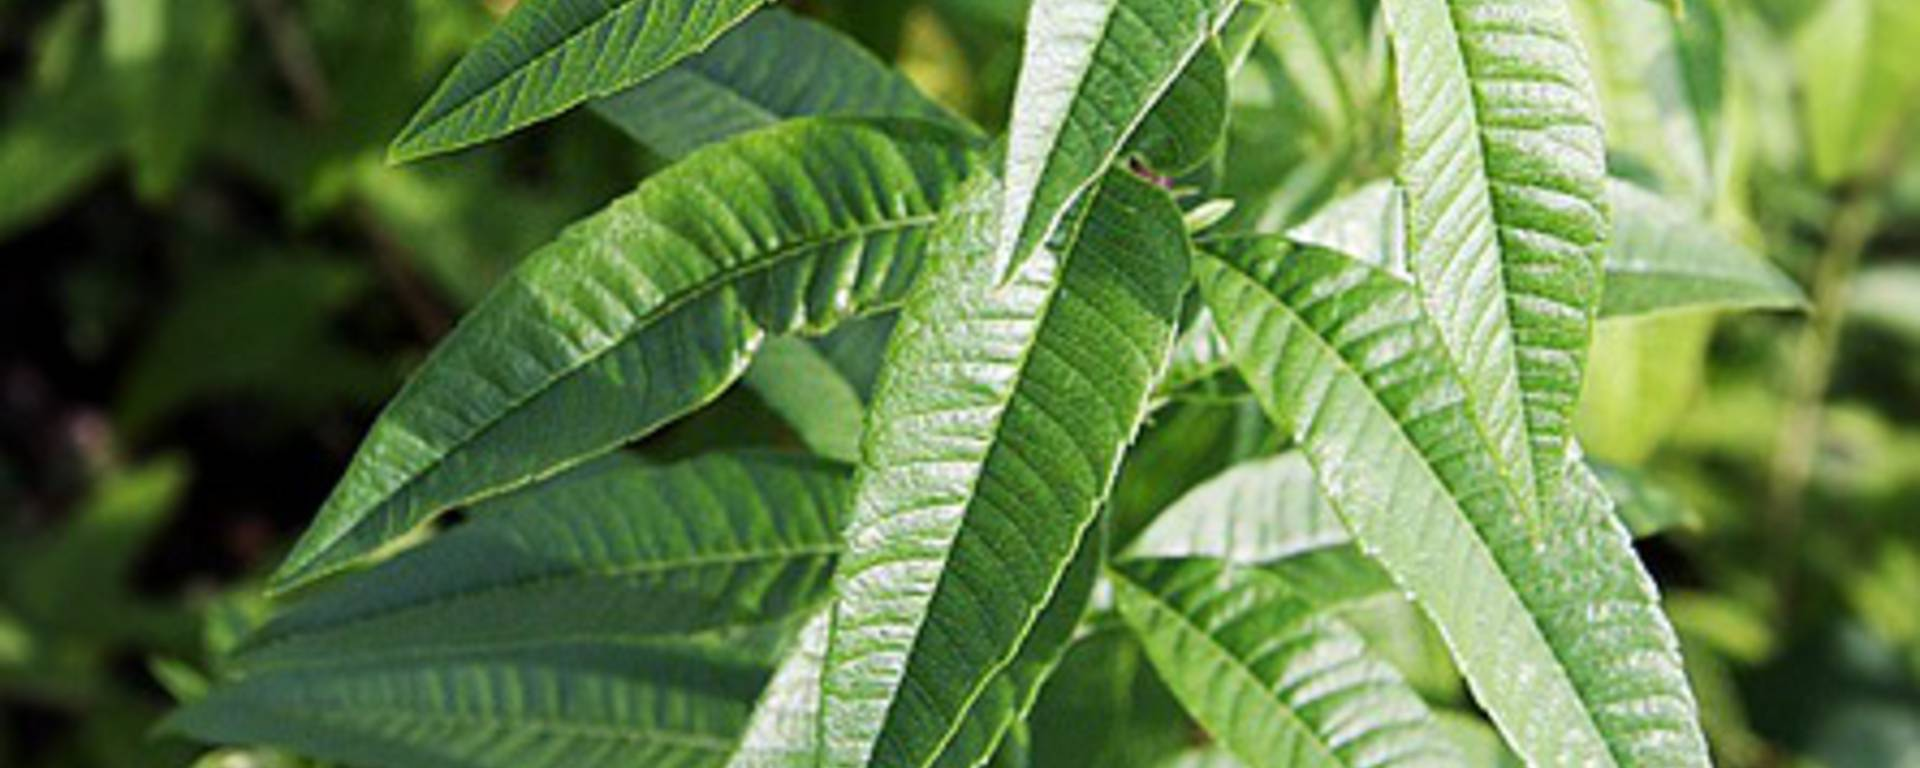 verveine tisane bien-être cocconing herbes plantes nature